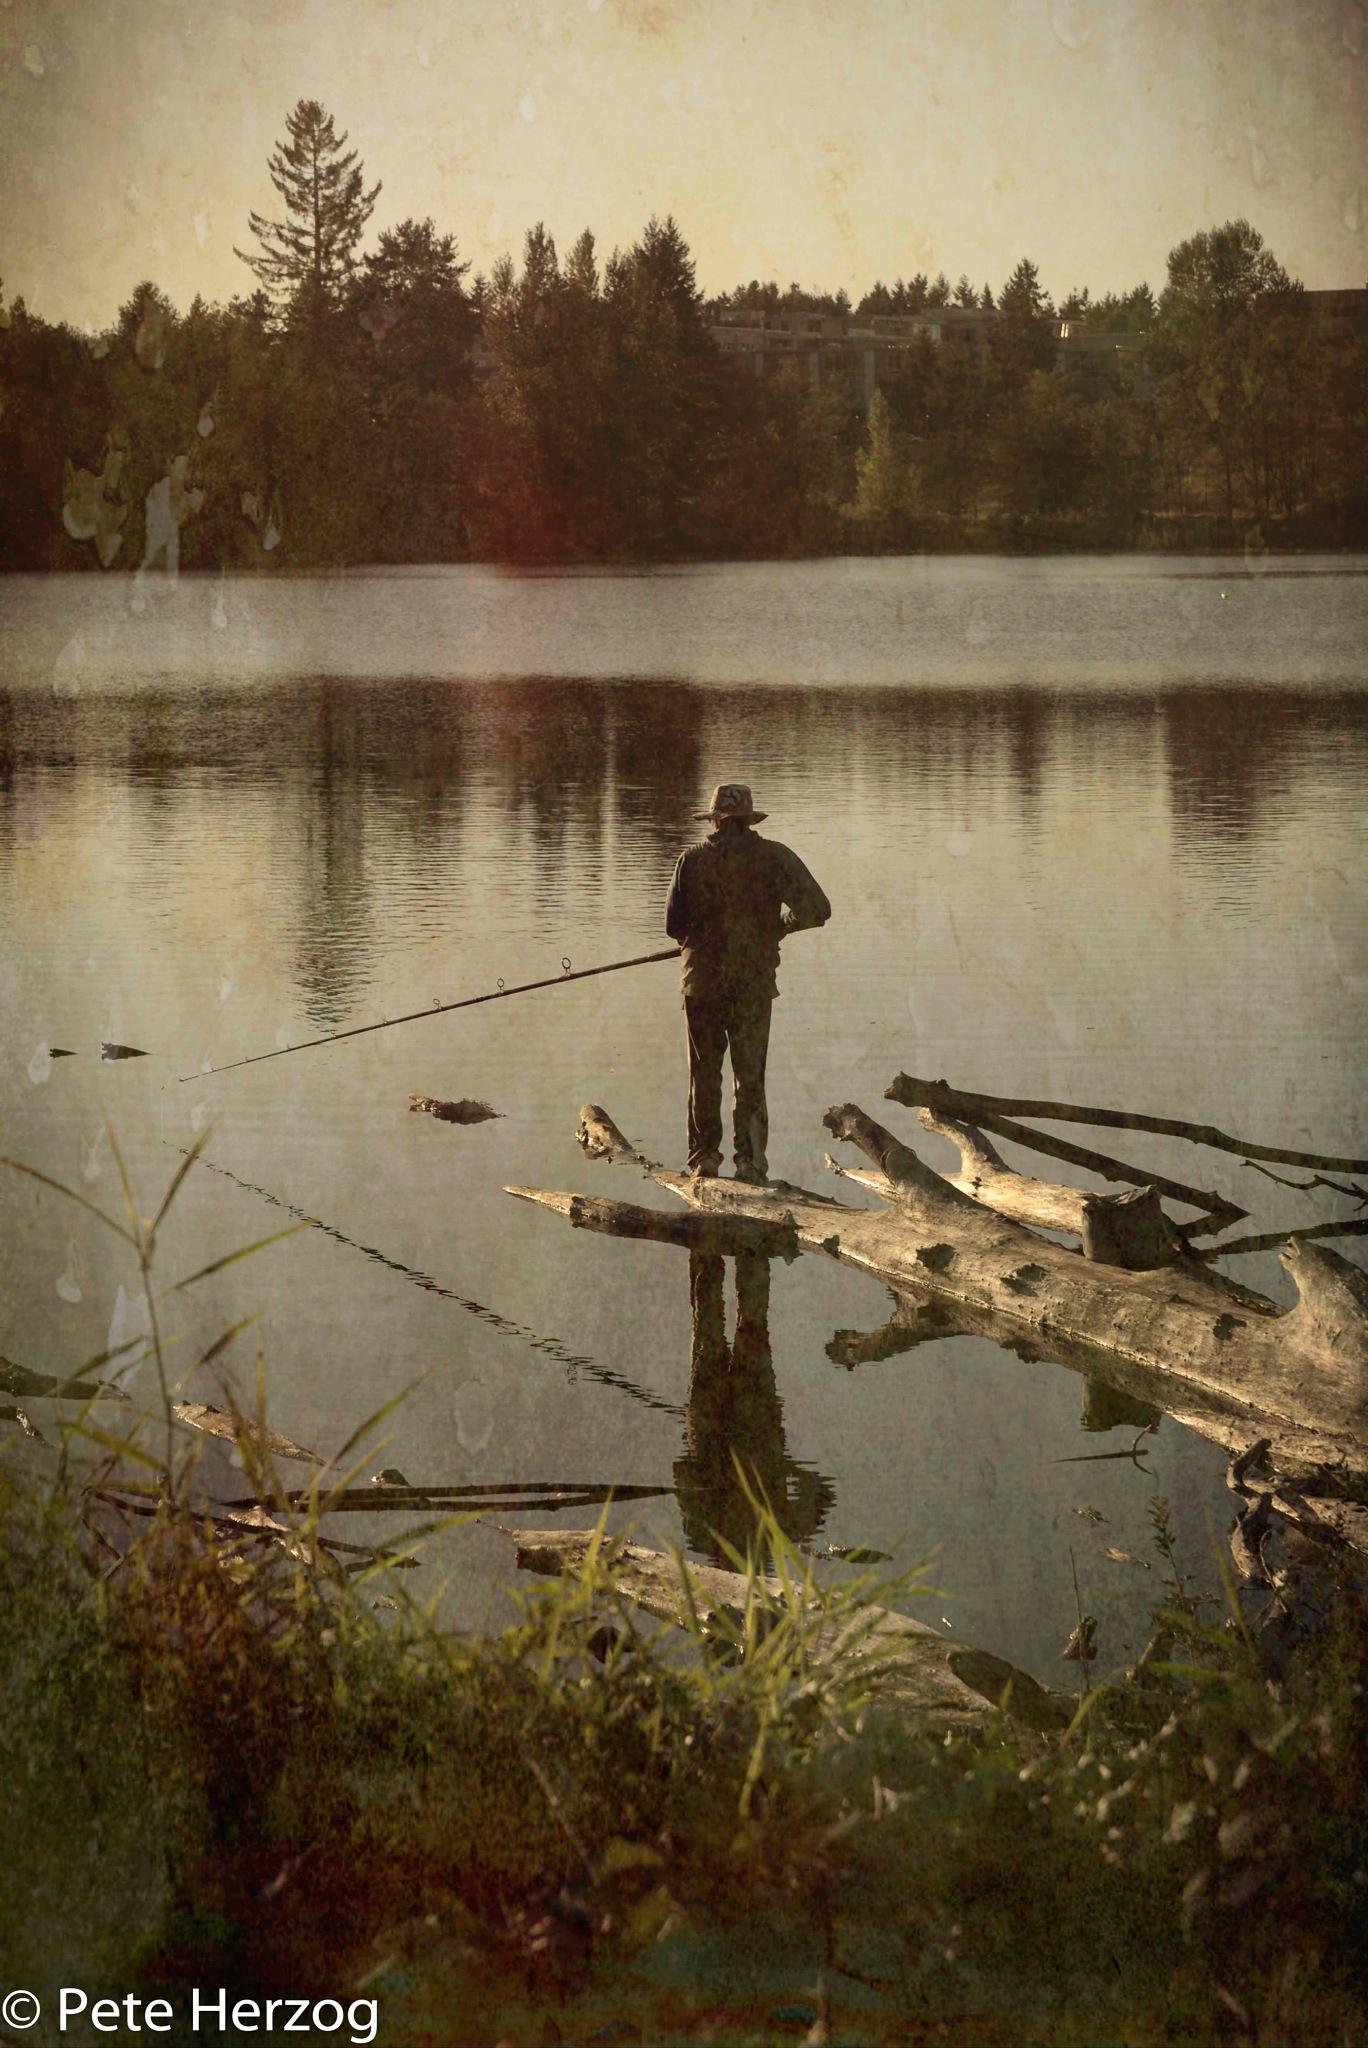 Fisherman at Dusk by peter.herzog.3323